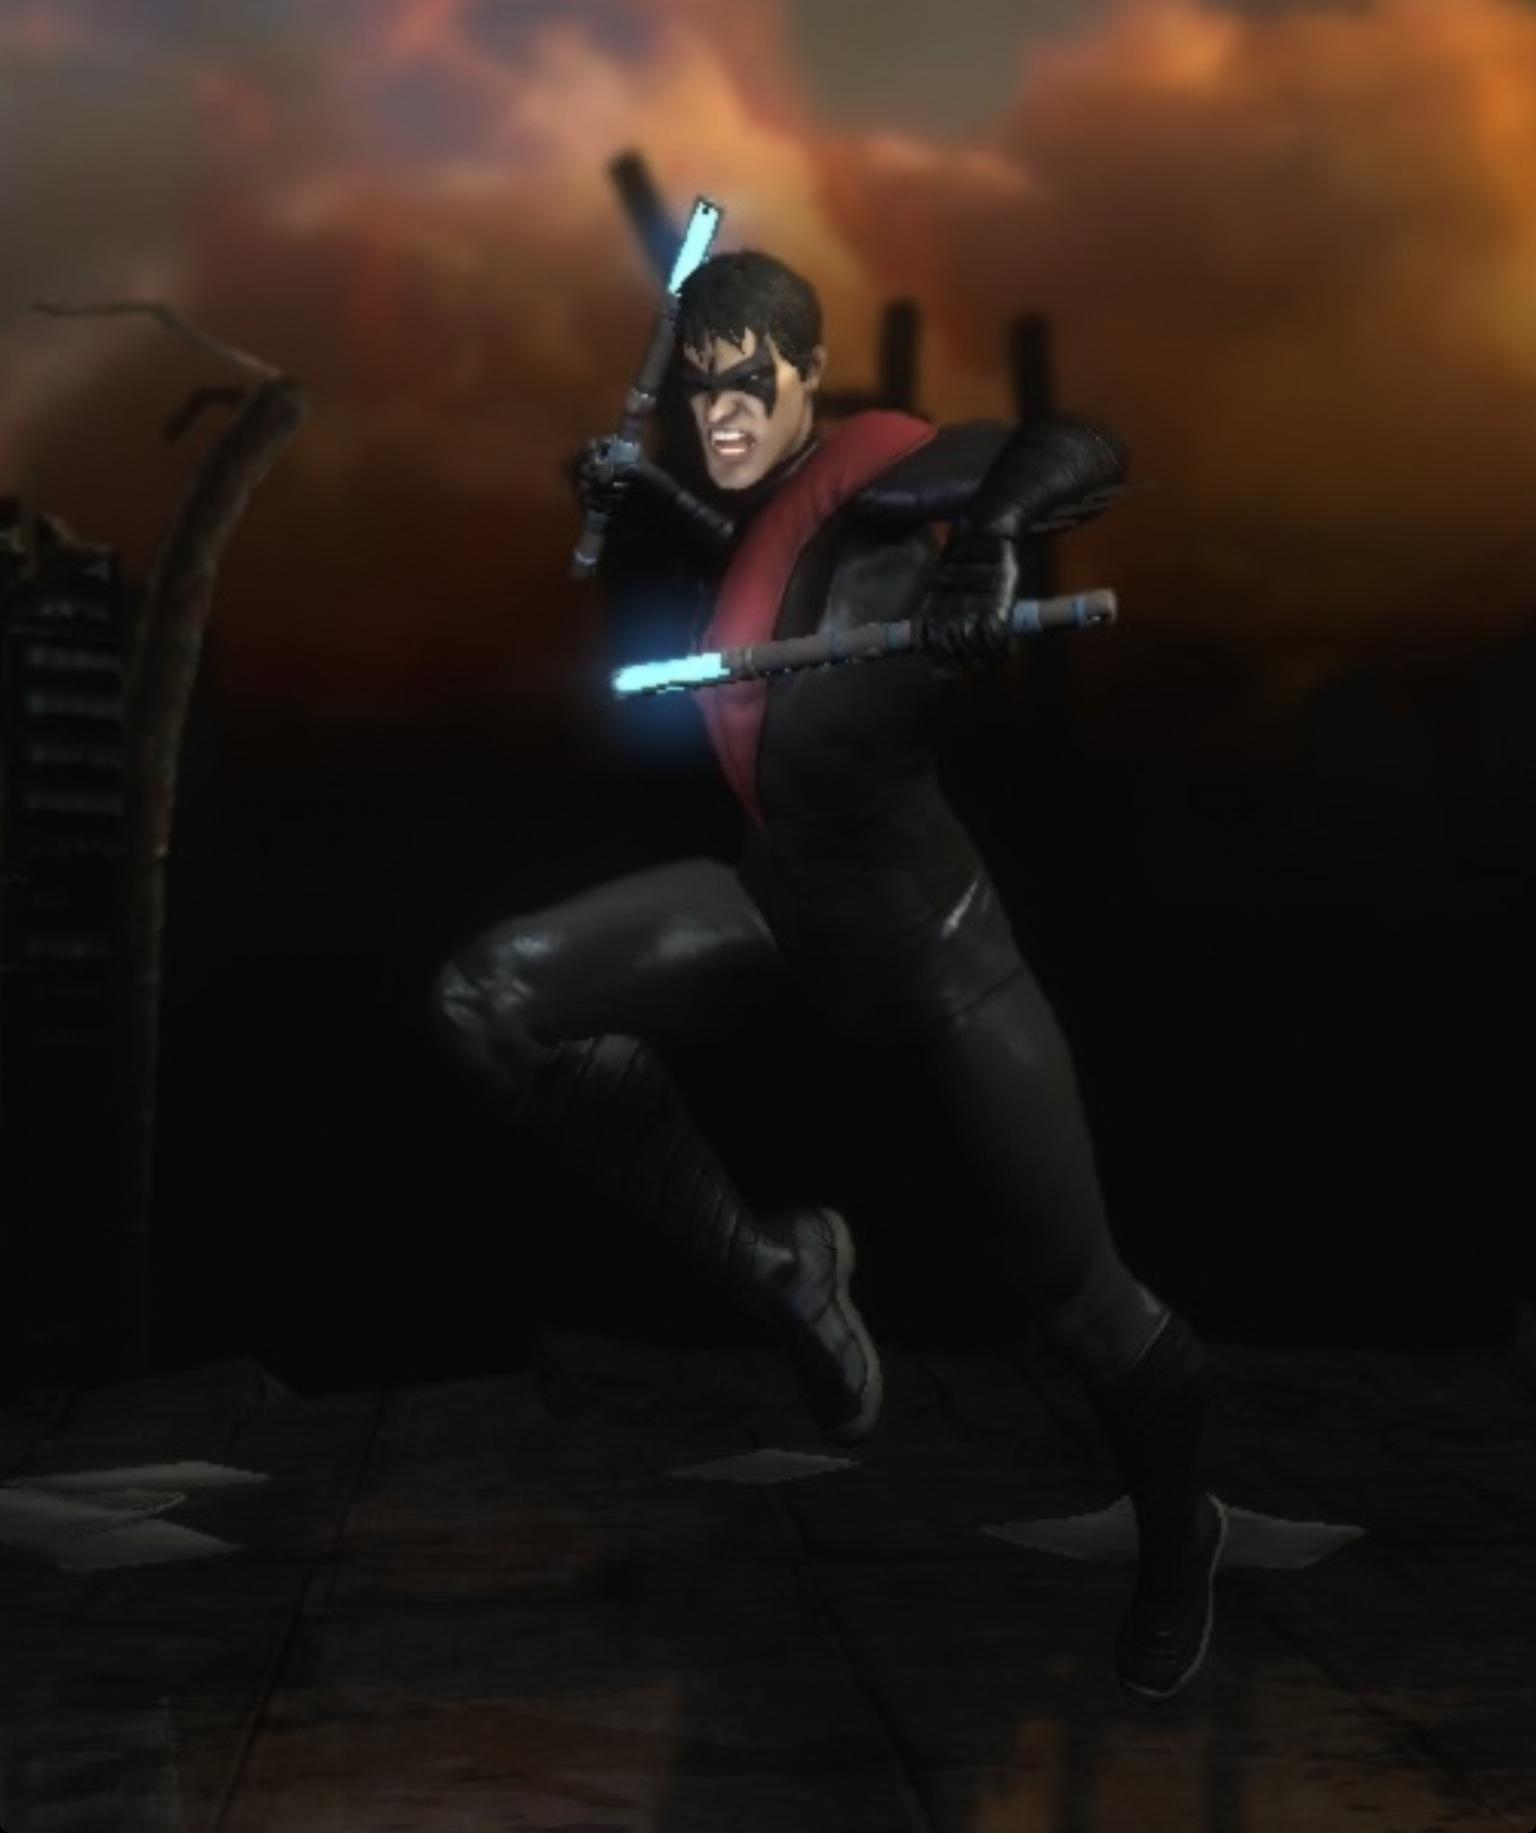 Image   Nightwing New 52jpg   InjusticeGods Among Us Wiki 1536x1833